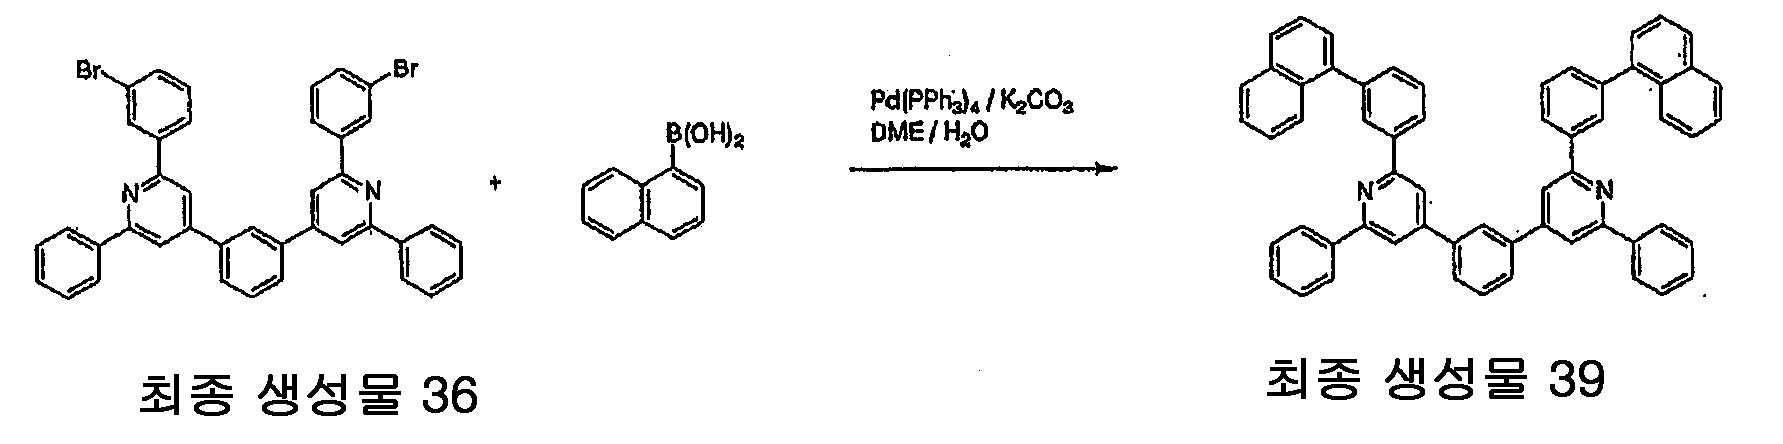 Figure 112010002231902-pat00130